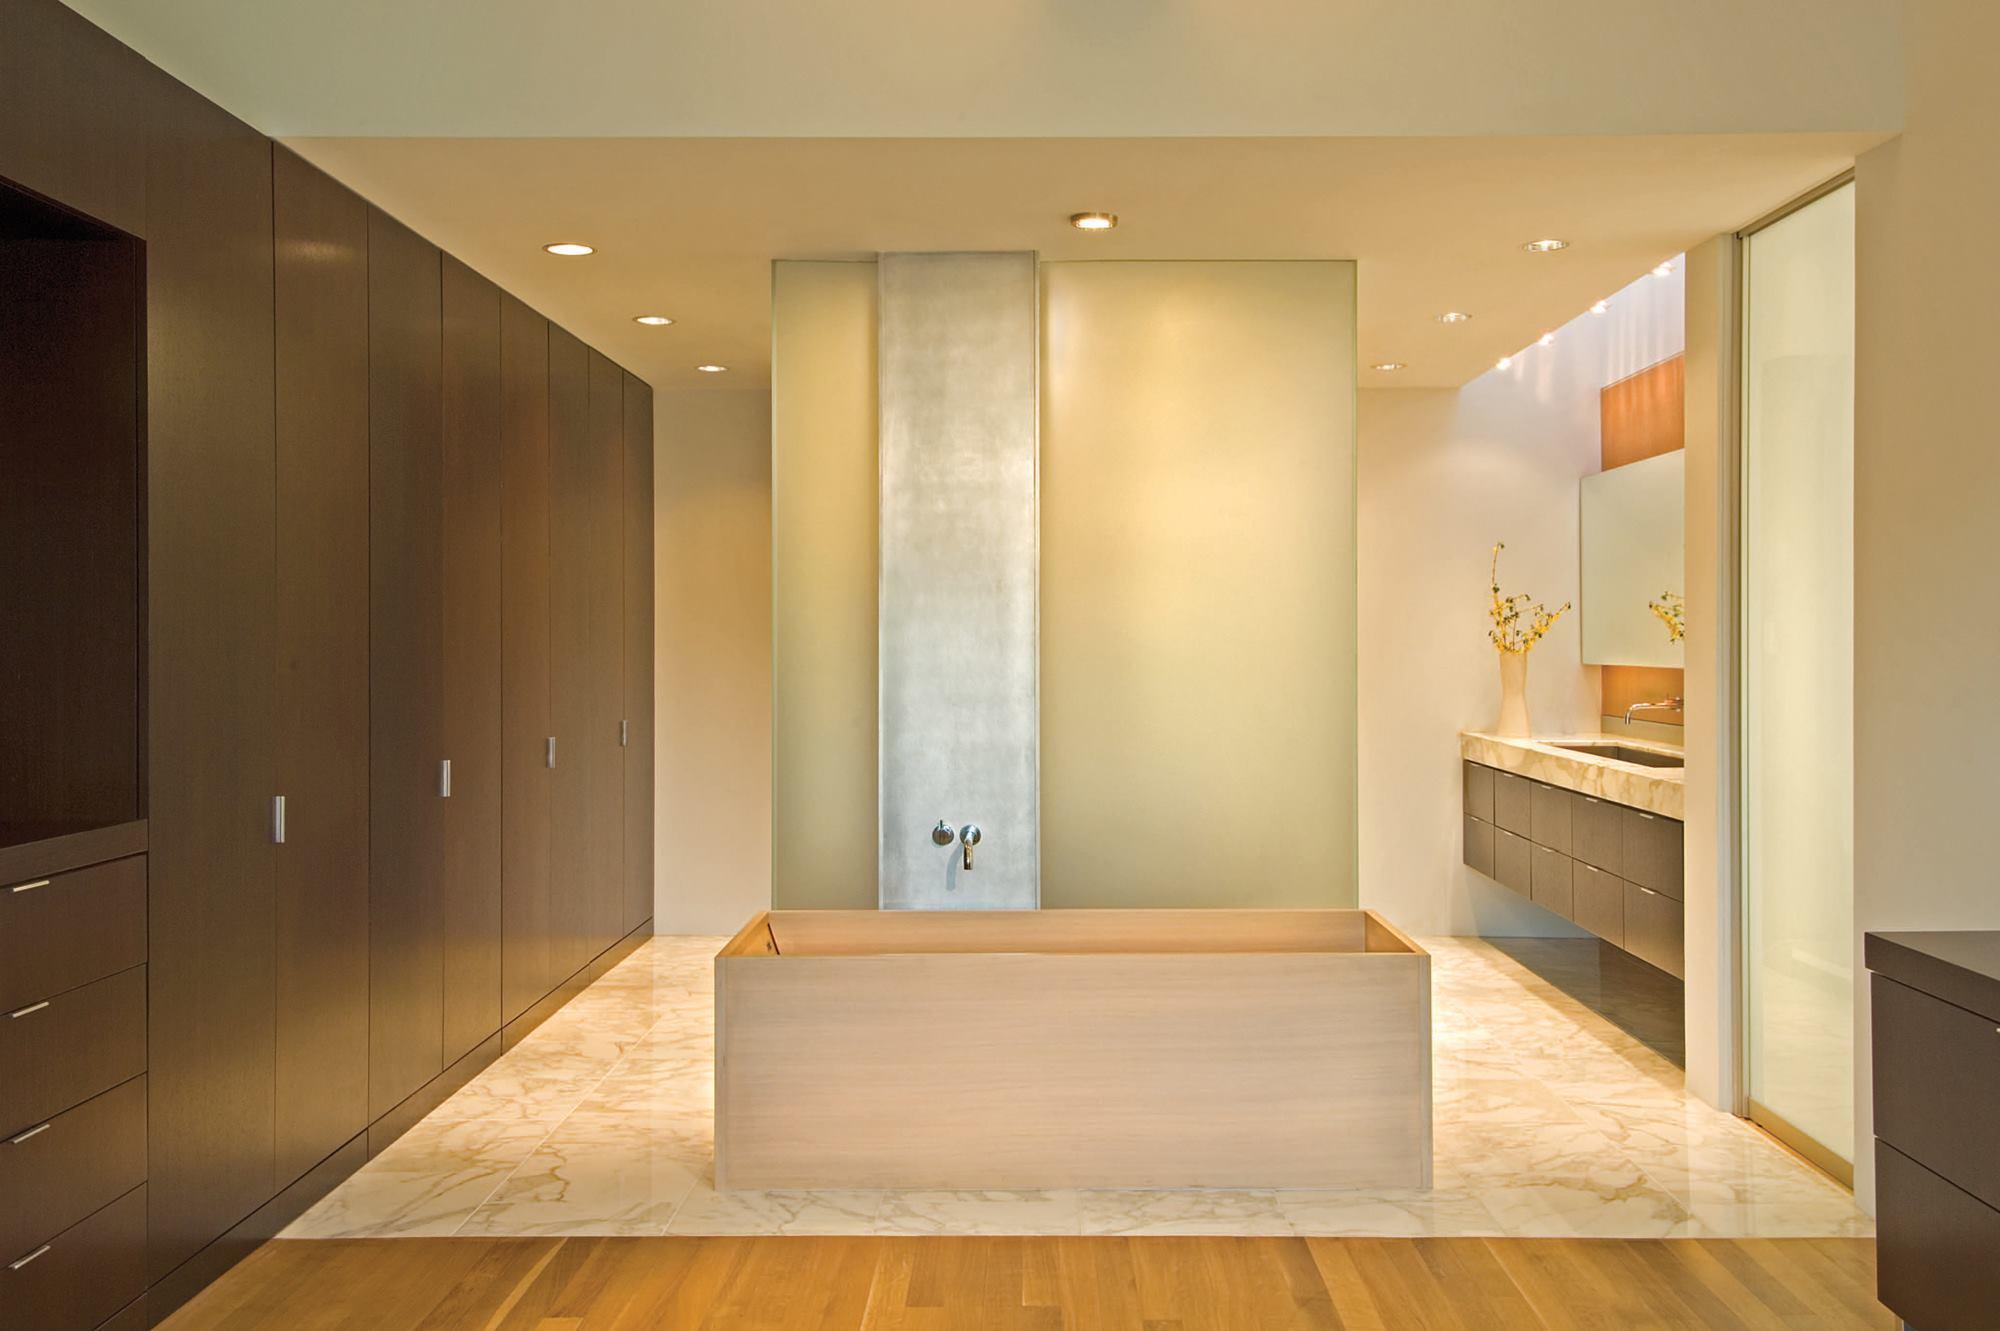 Suite 4511 Washington D C Custom Home Magazine Bath Fixtures Design Award Winners